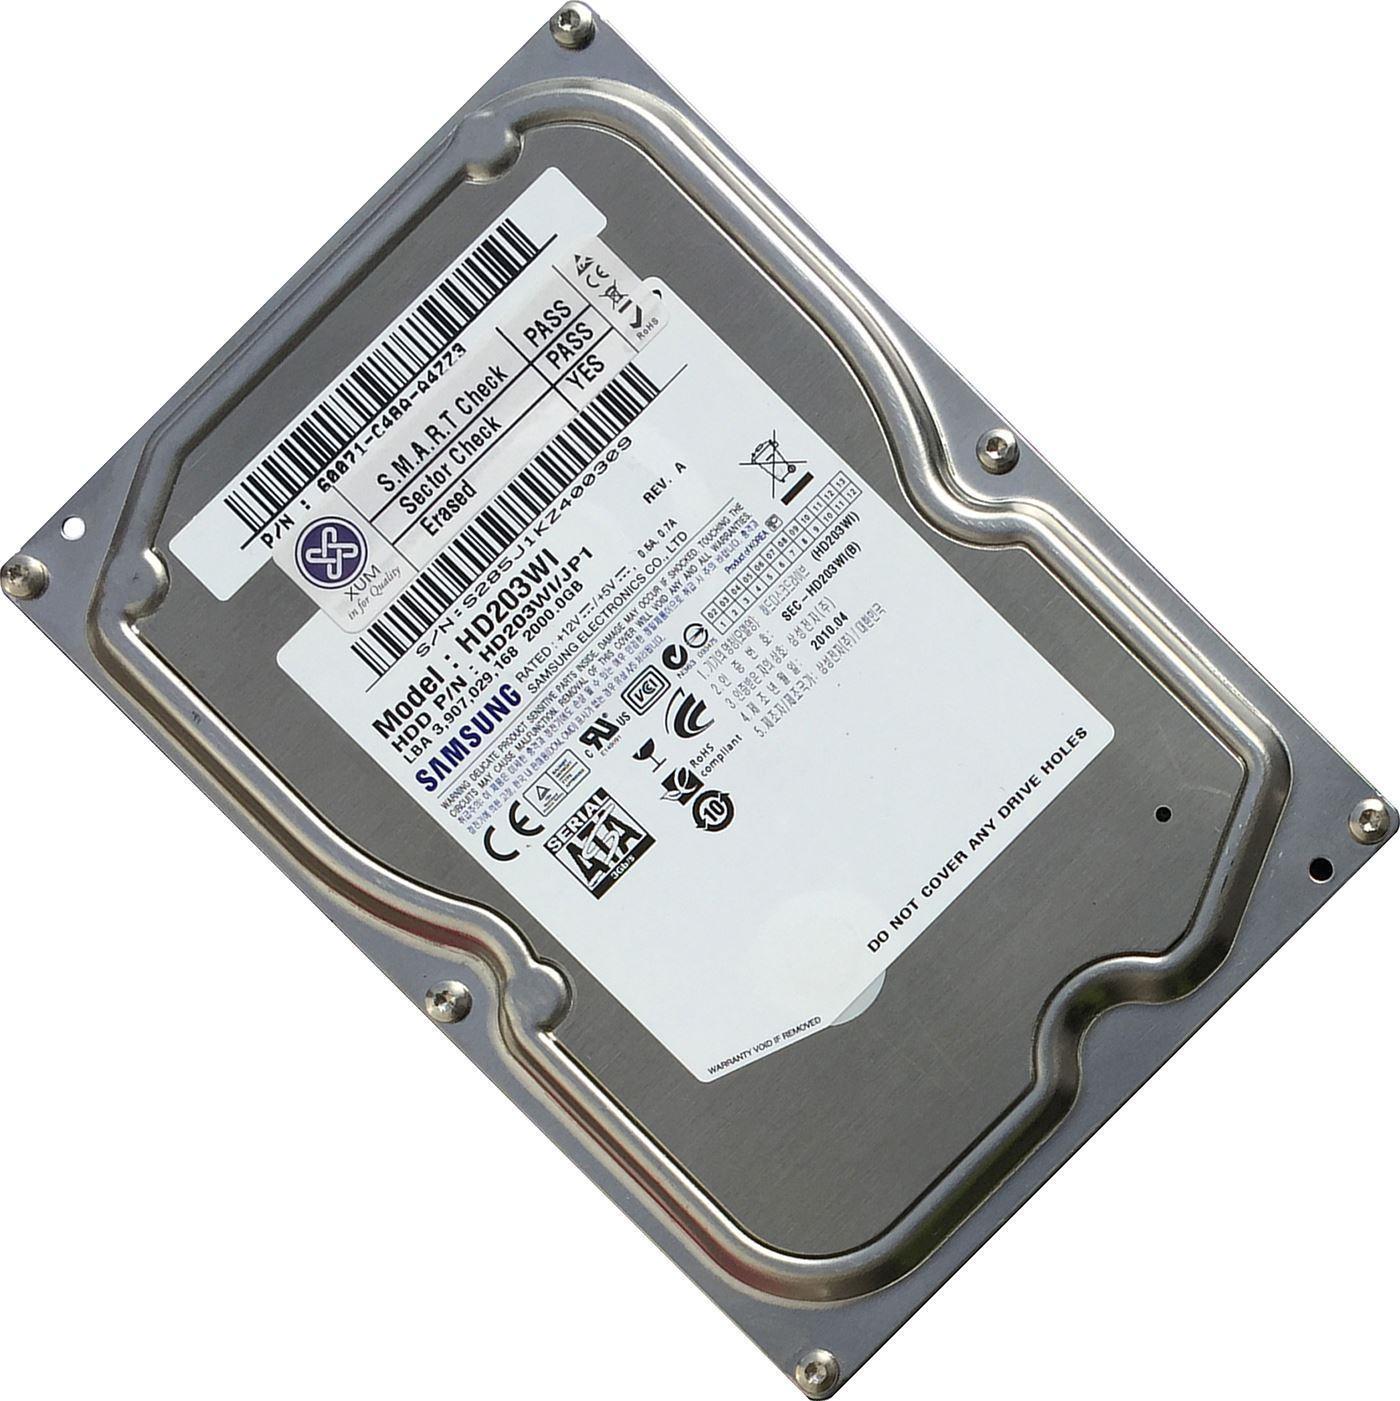 500GB-640GB-750GB-1TB-2TB-3TB-4TB-6TB-8TB-10TB-3-5-034-disco-duro-SATA-HDD-Lote miniatura 14